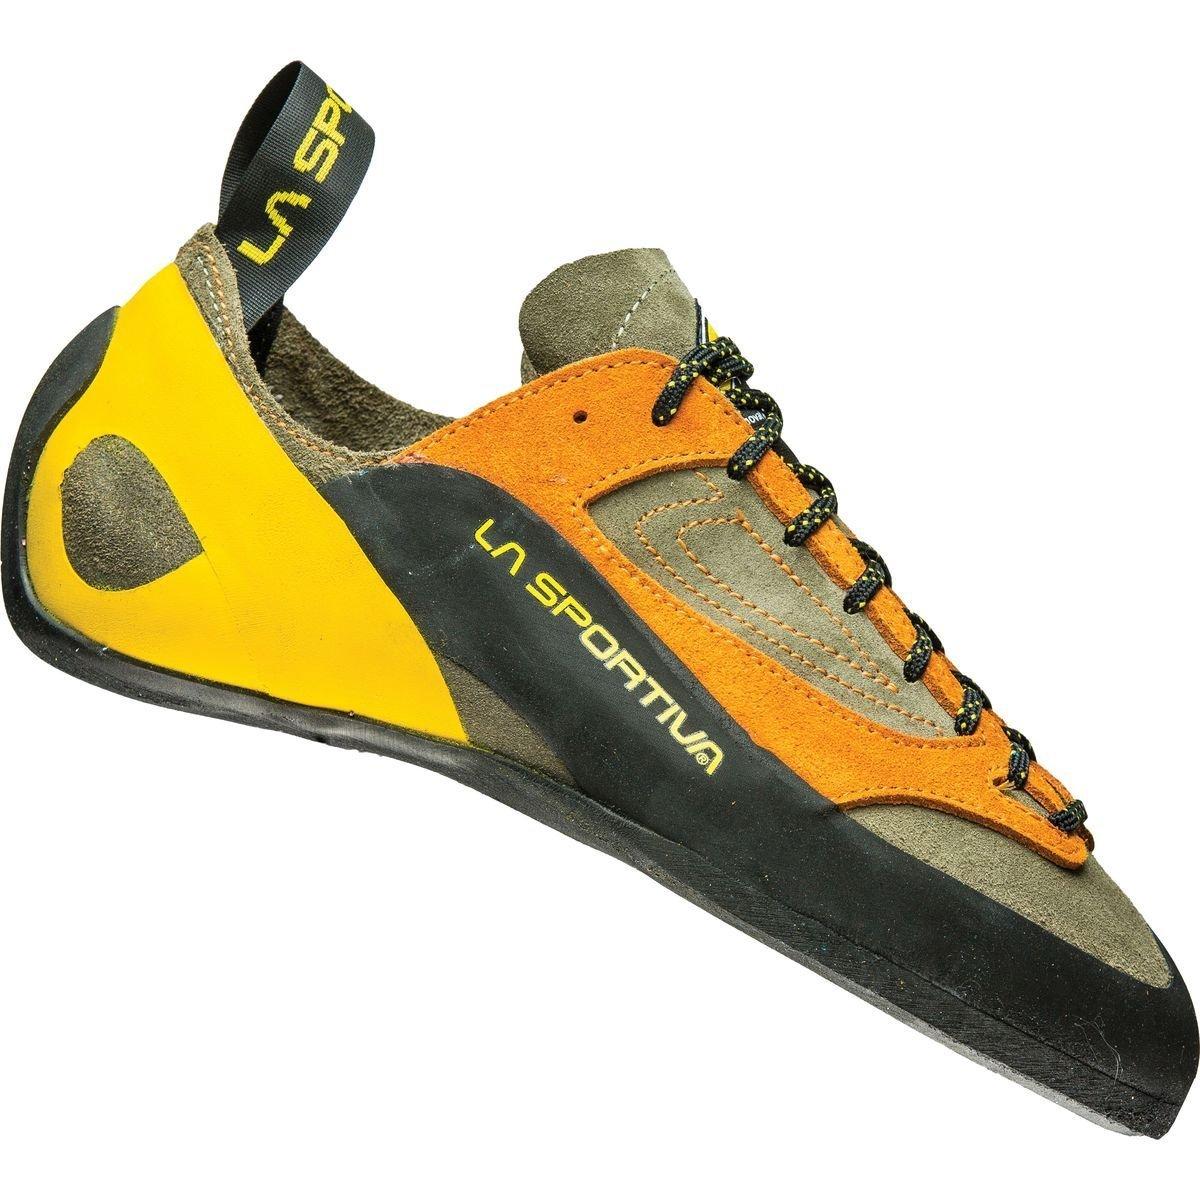 La Sportiva Finale Climbing Shoe - Men's 10V-BO-43.5